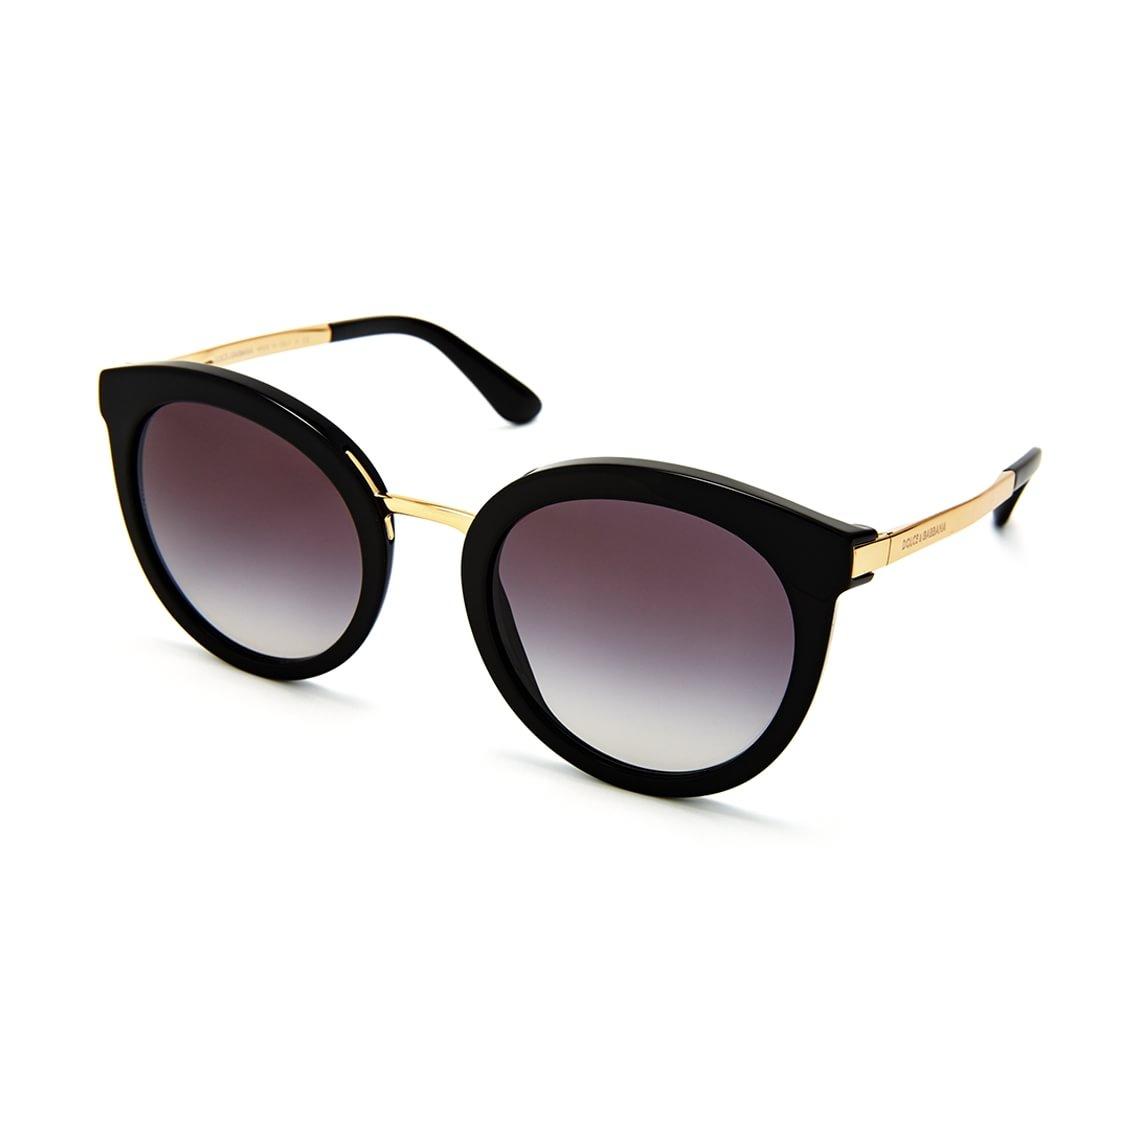 Dolce & Gabbana DG4268 501/8G 5222